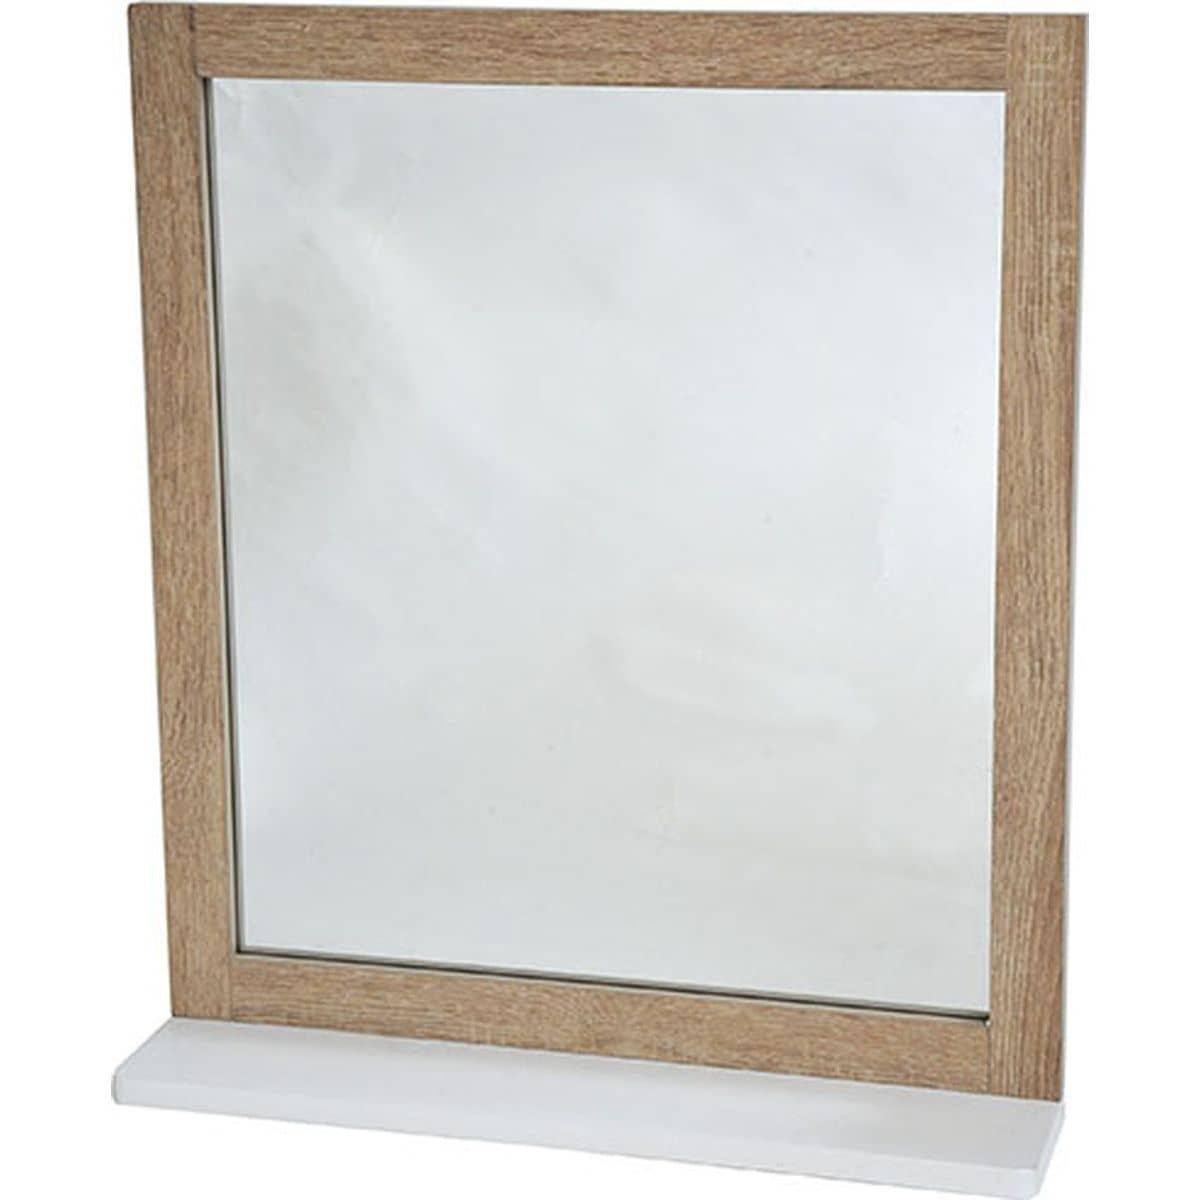 4goodz Badkamer spiegel Vierkant Stockholm 48x10x53 cm - wit/bruin